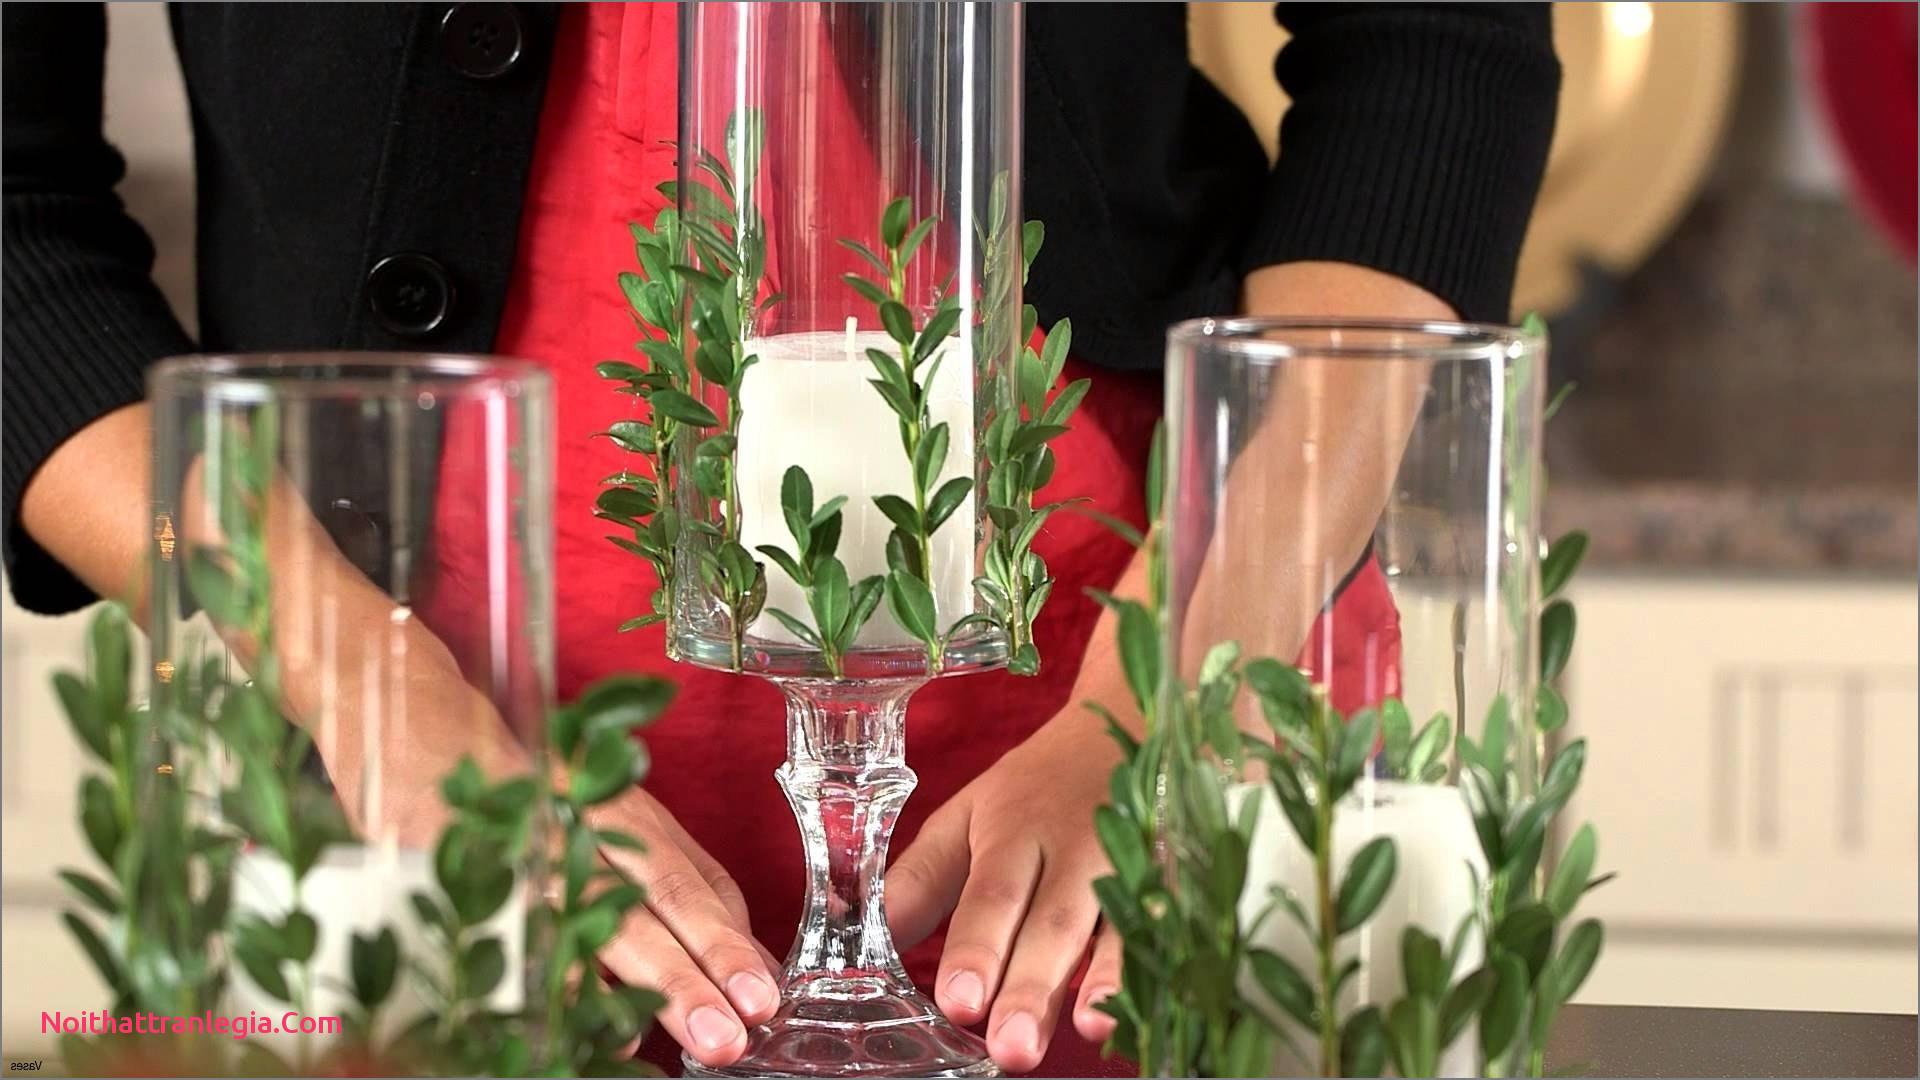 decorative plastic vases of 20 wedding vases noithattranlegia vases design inside wedding centerpiece decoration ideas unique dollar tree wedding decorations awesome h vases dollar vase i 0d